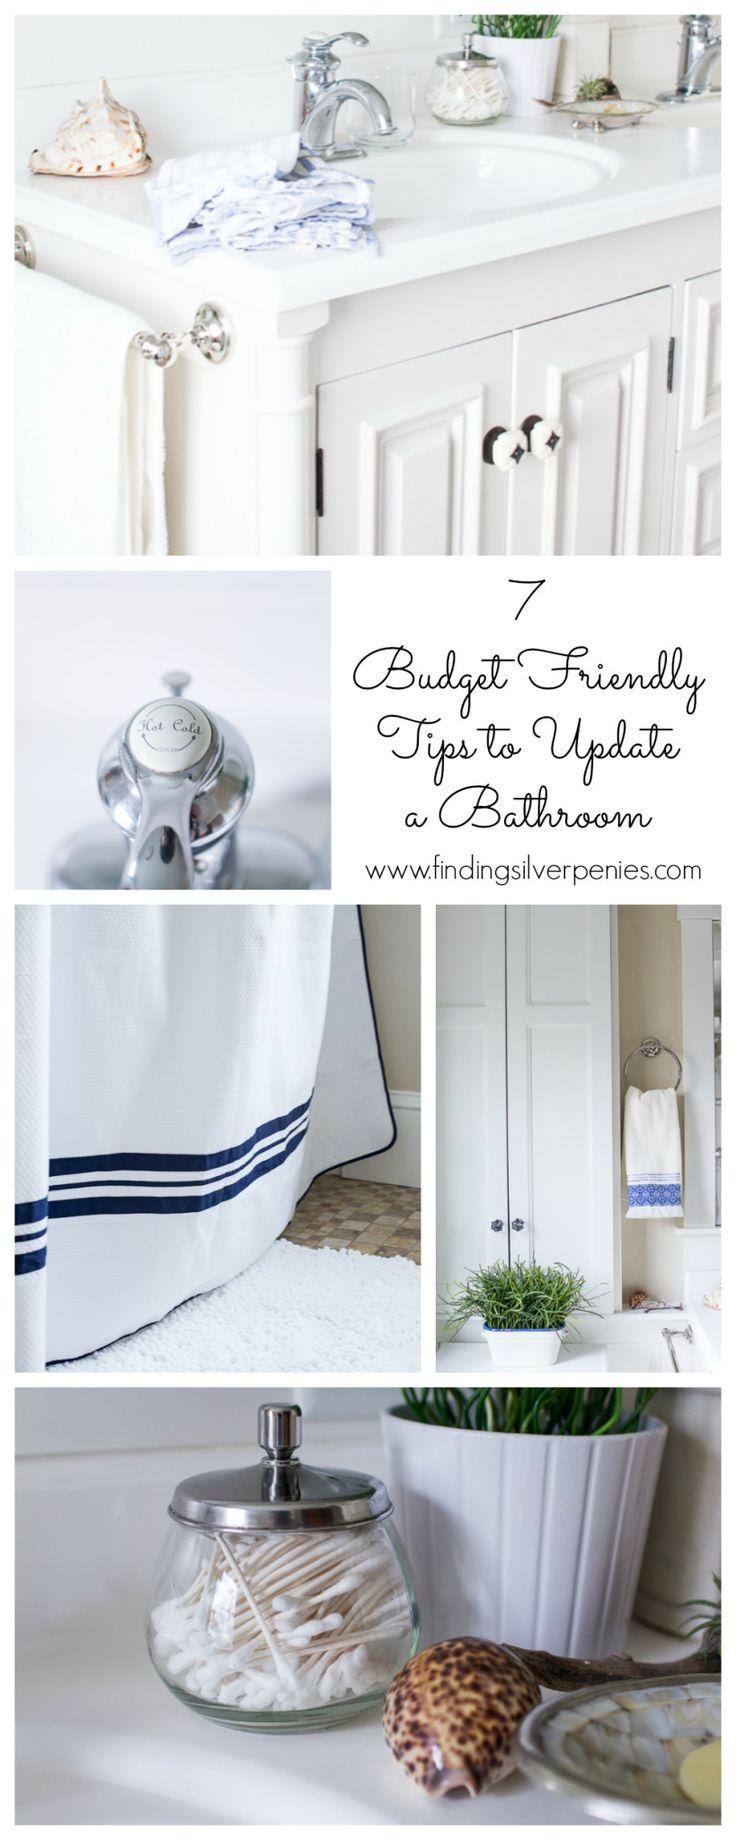 Best Bathrooms Images On Pinterest Bathroom Ideas Bathroom - Budget friendly bathroom remodel for bathroom decor ideas